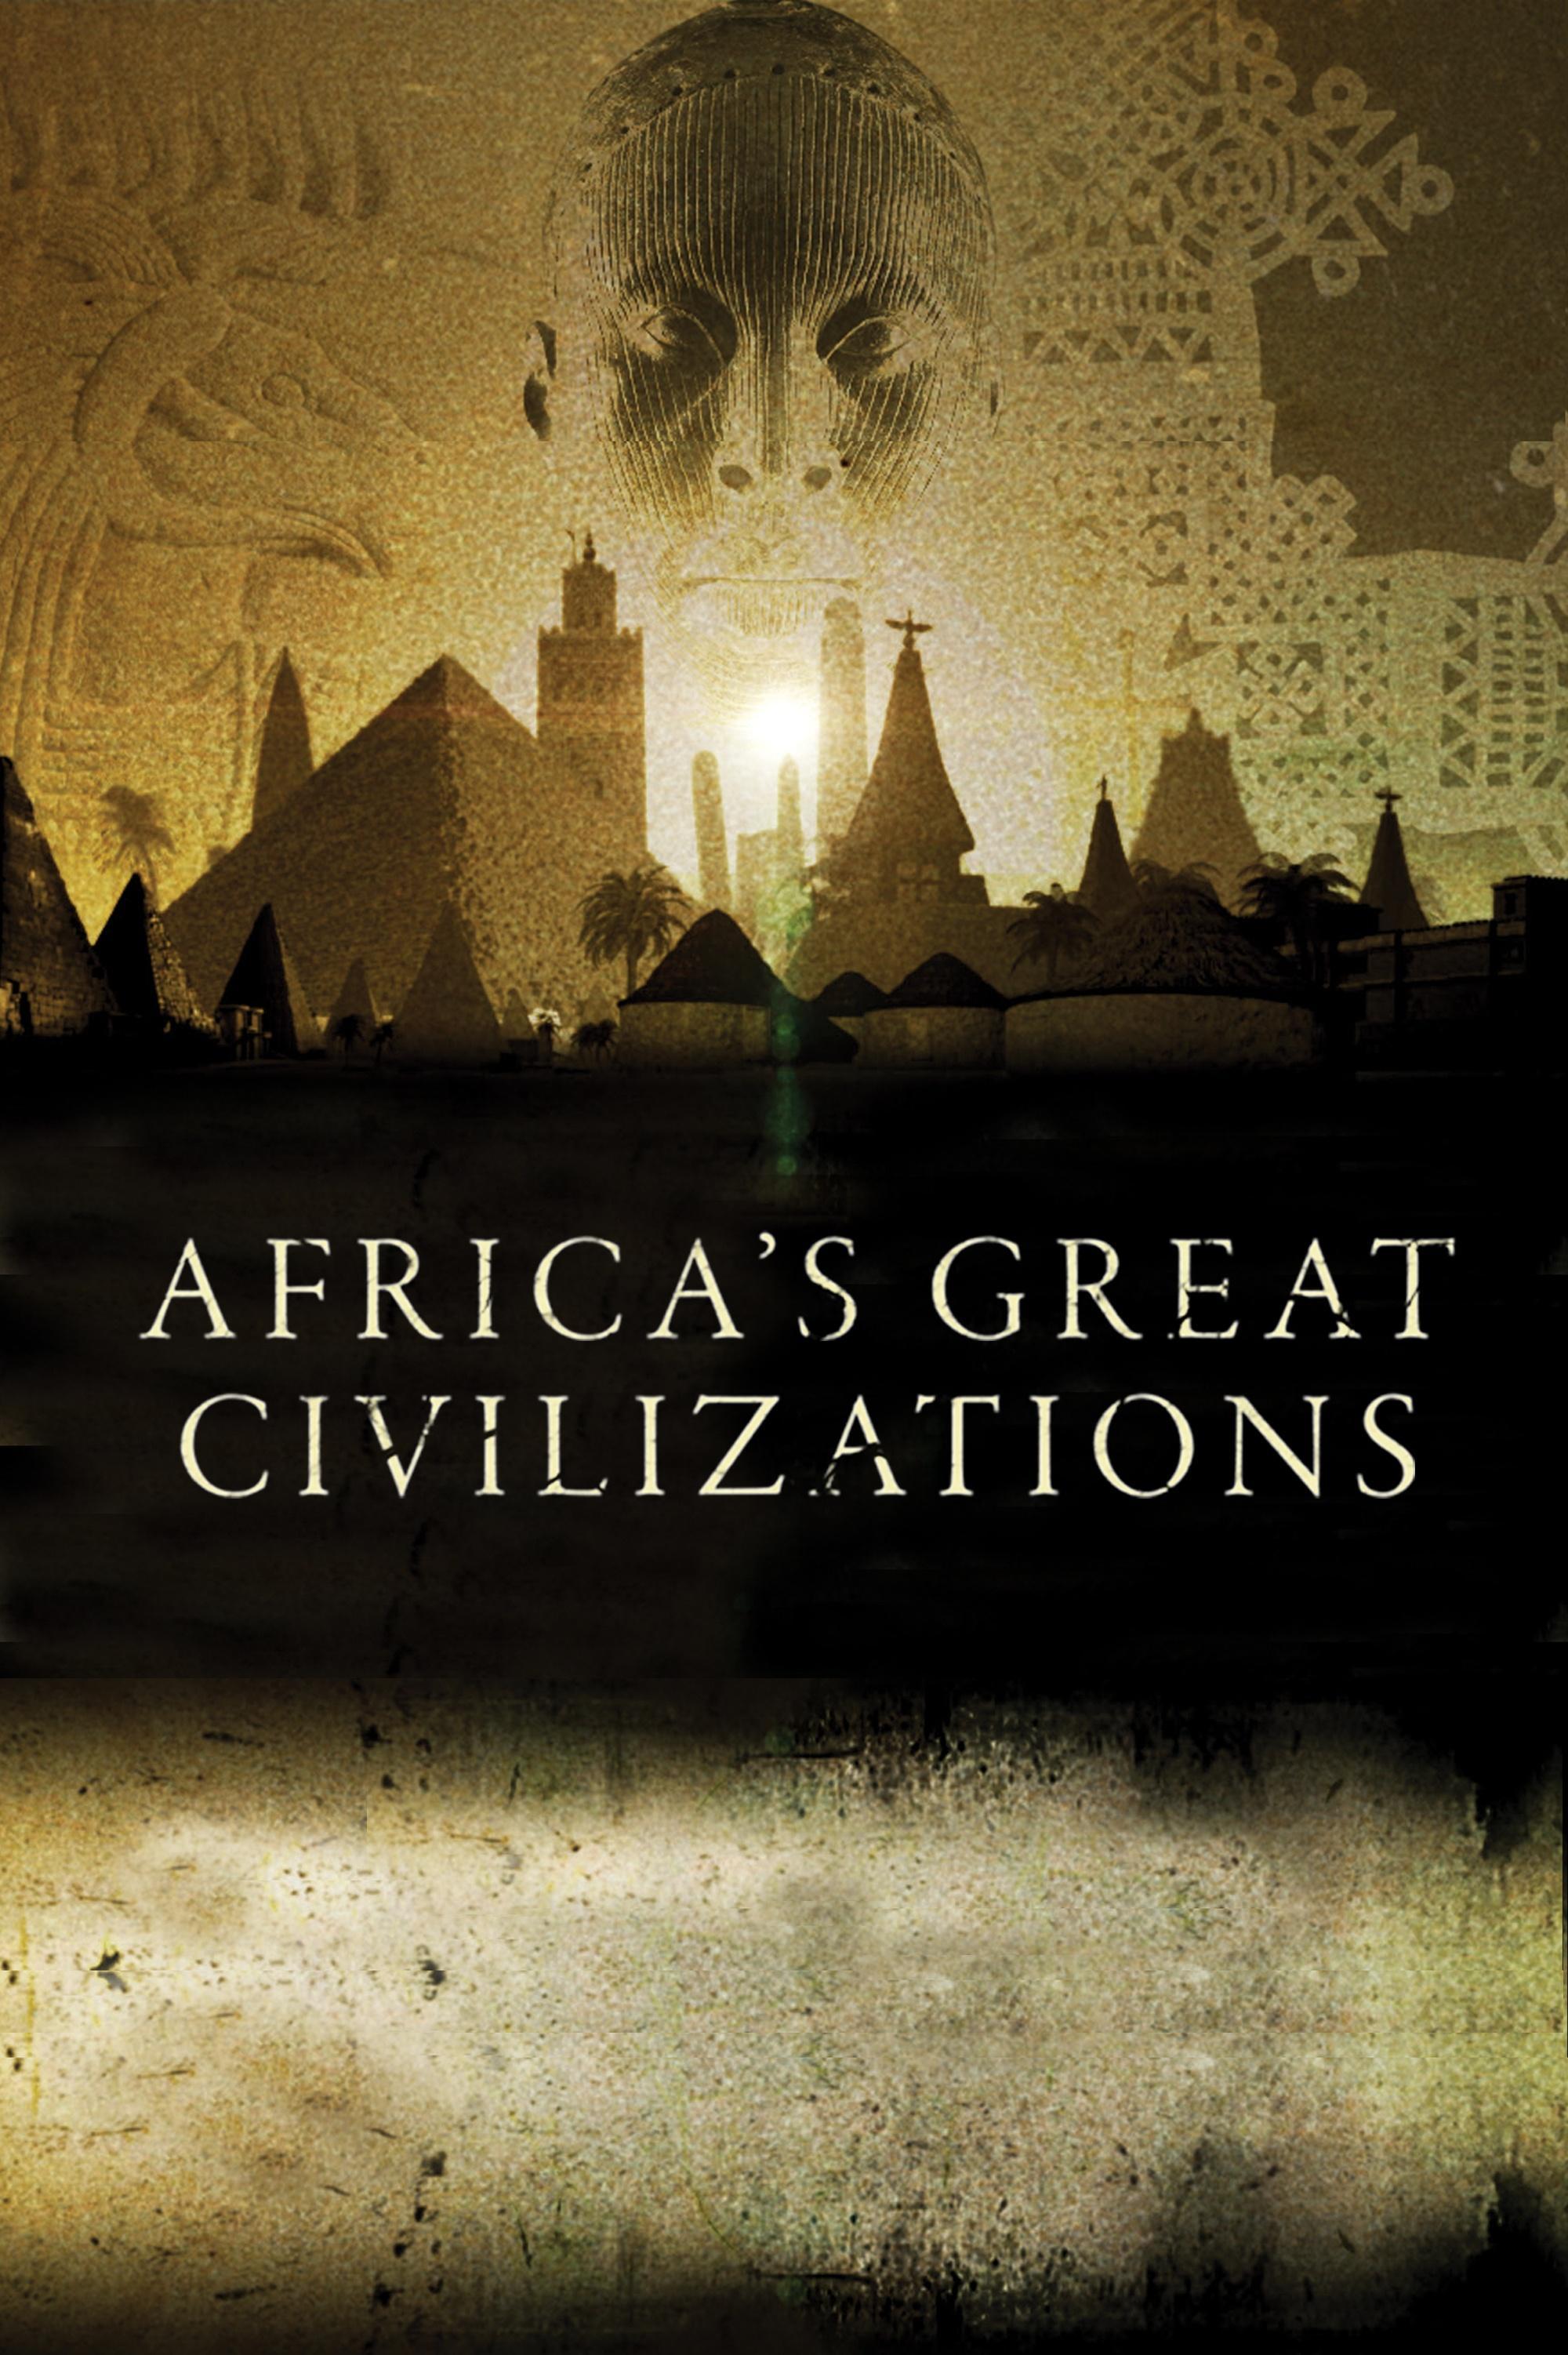 Africa's Great Civilizations-juneteenth